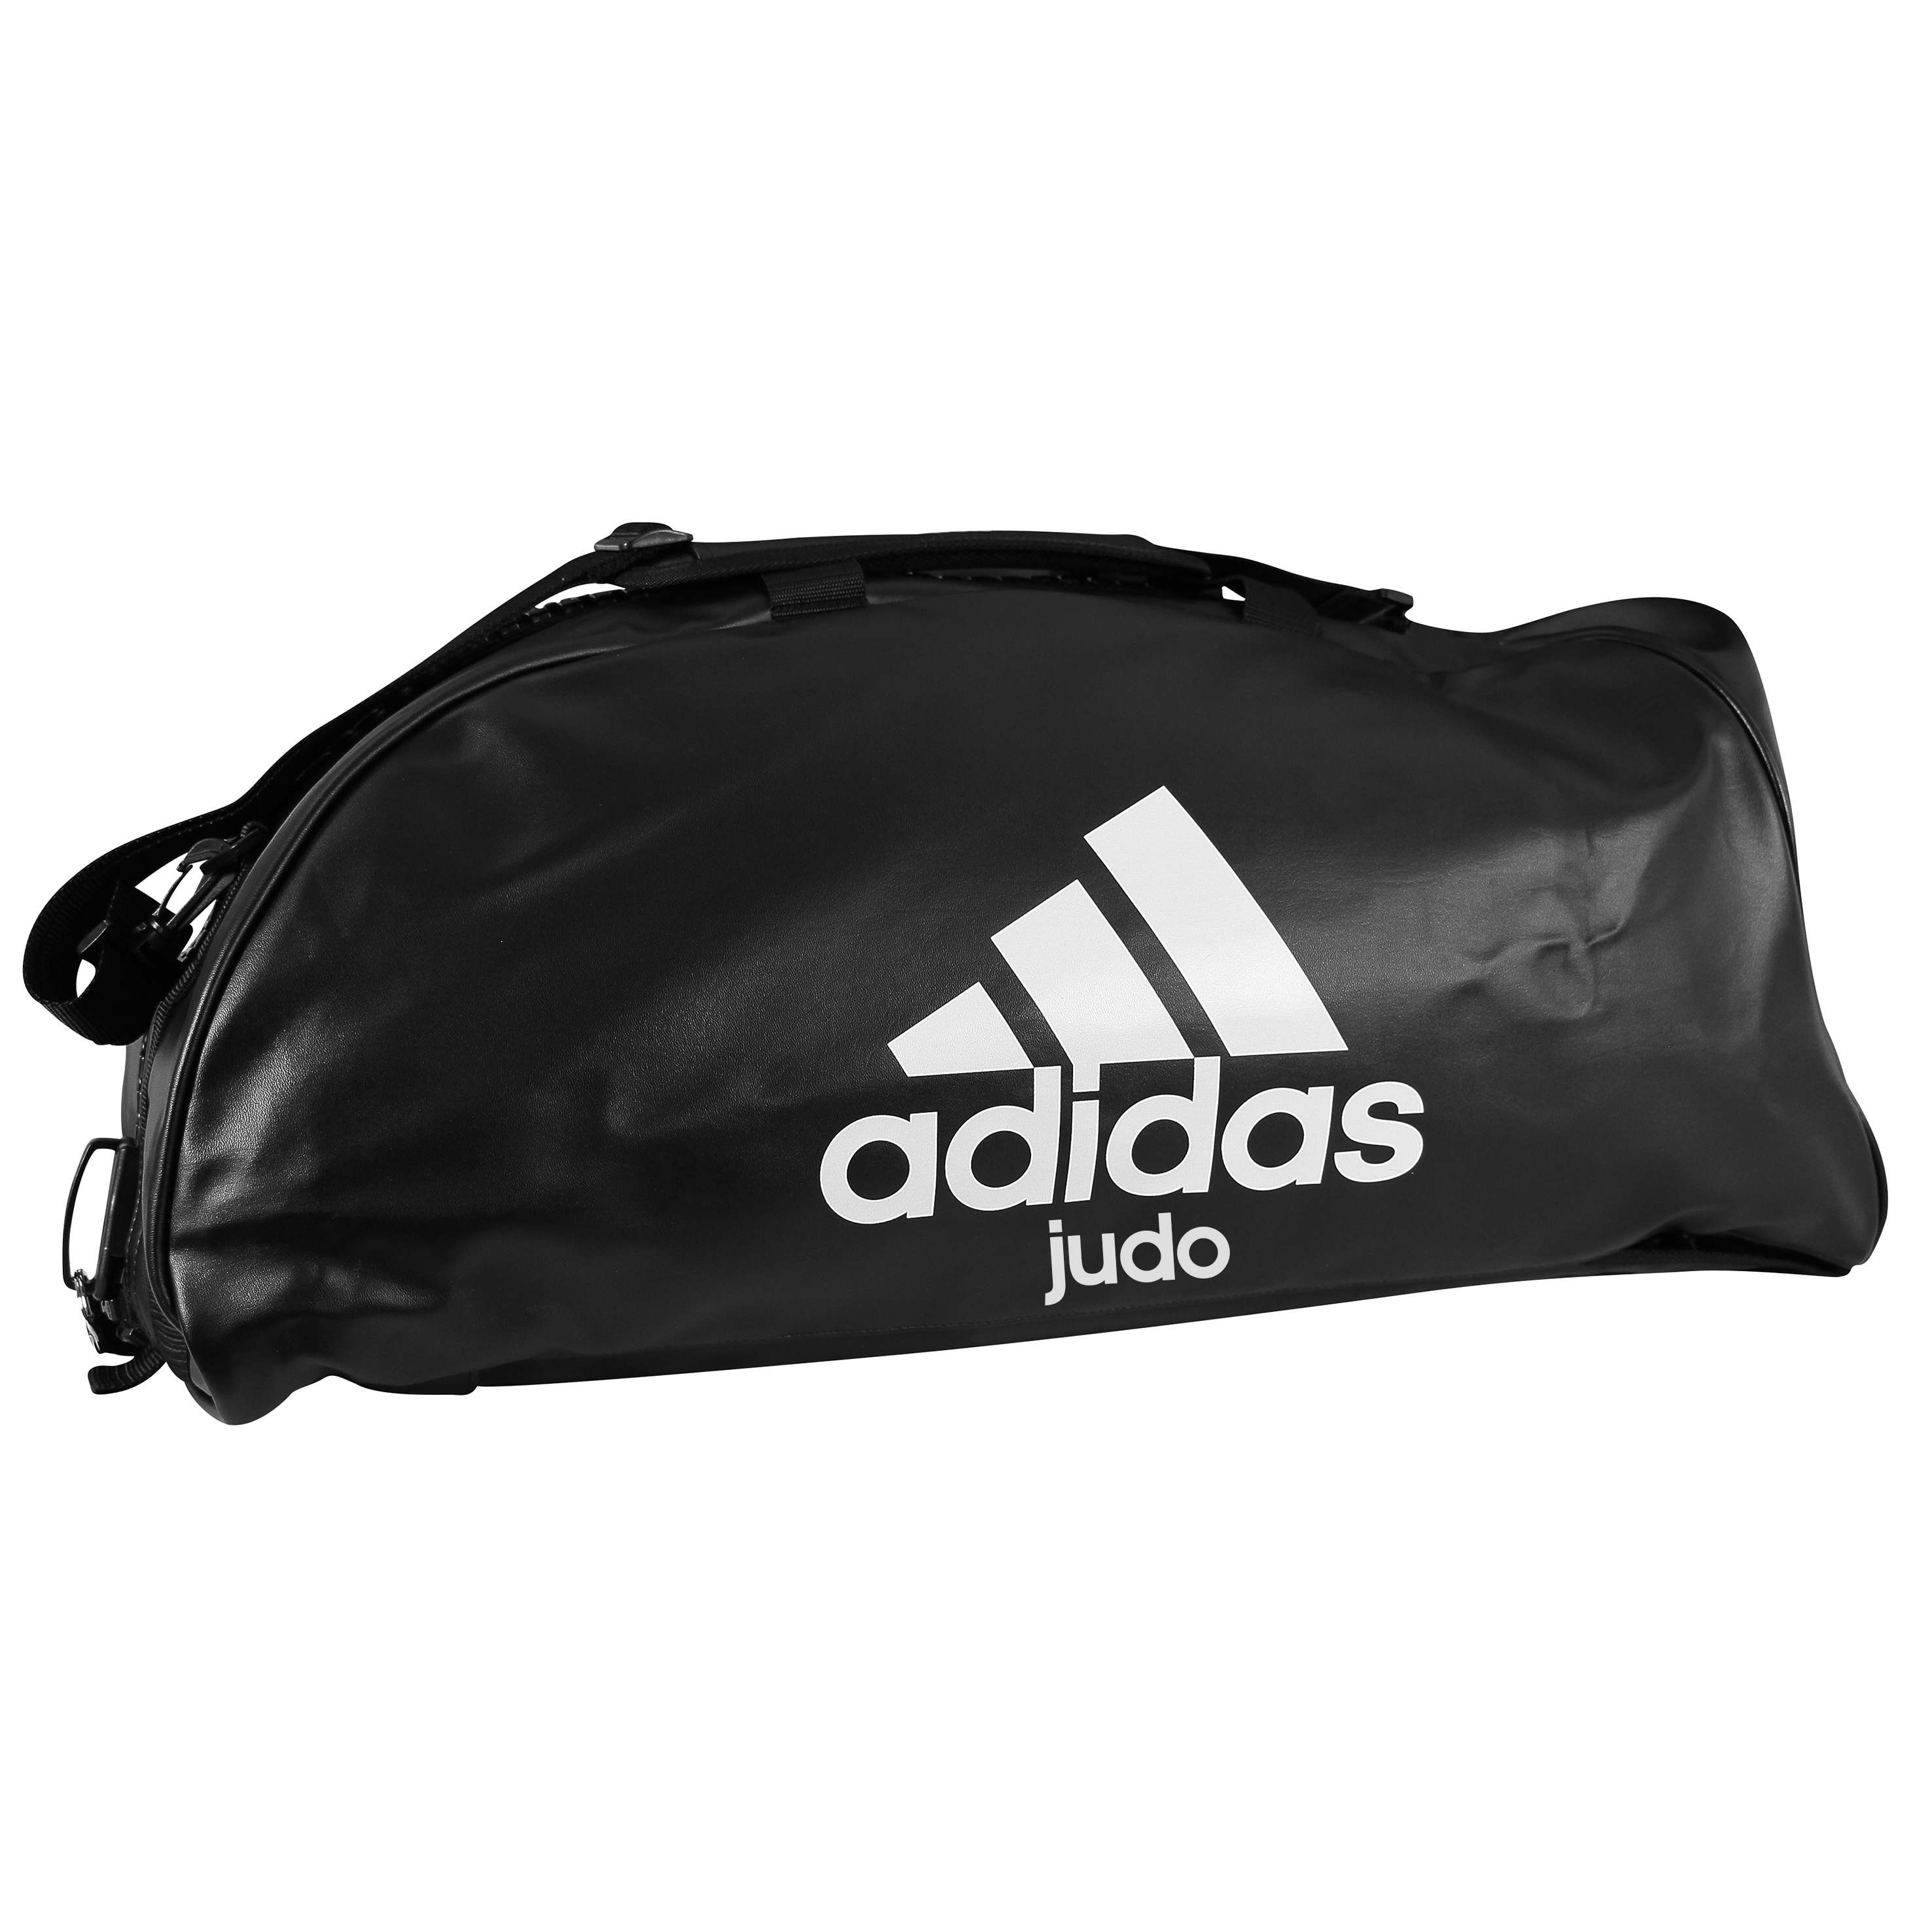 829a444b2390 Home   Equipment   Bags   2-in-1 Training Bag - Black   White - Medium